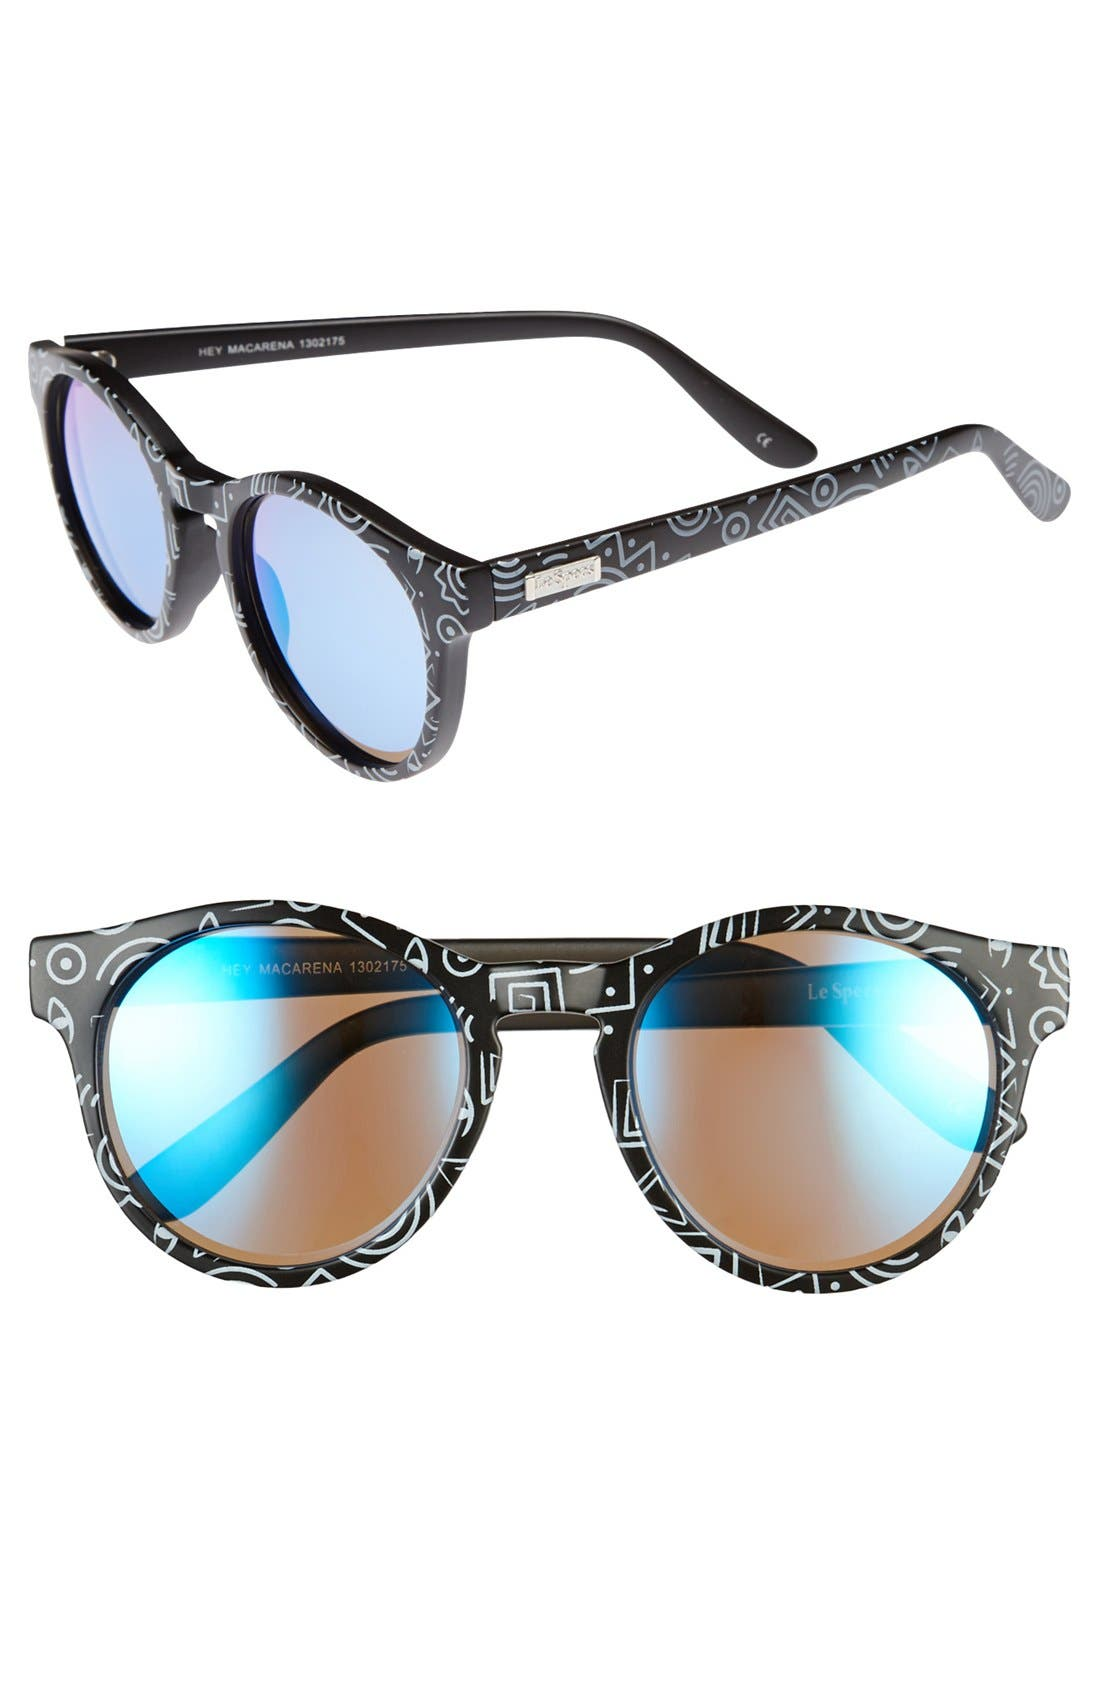 Main Image - Le Specs Retro 51mm Sunglasses